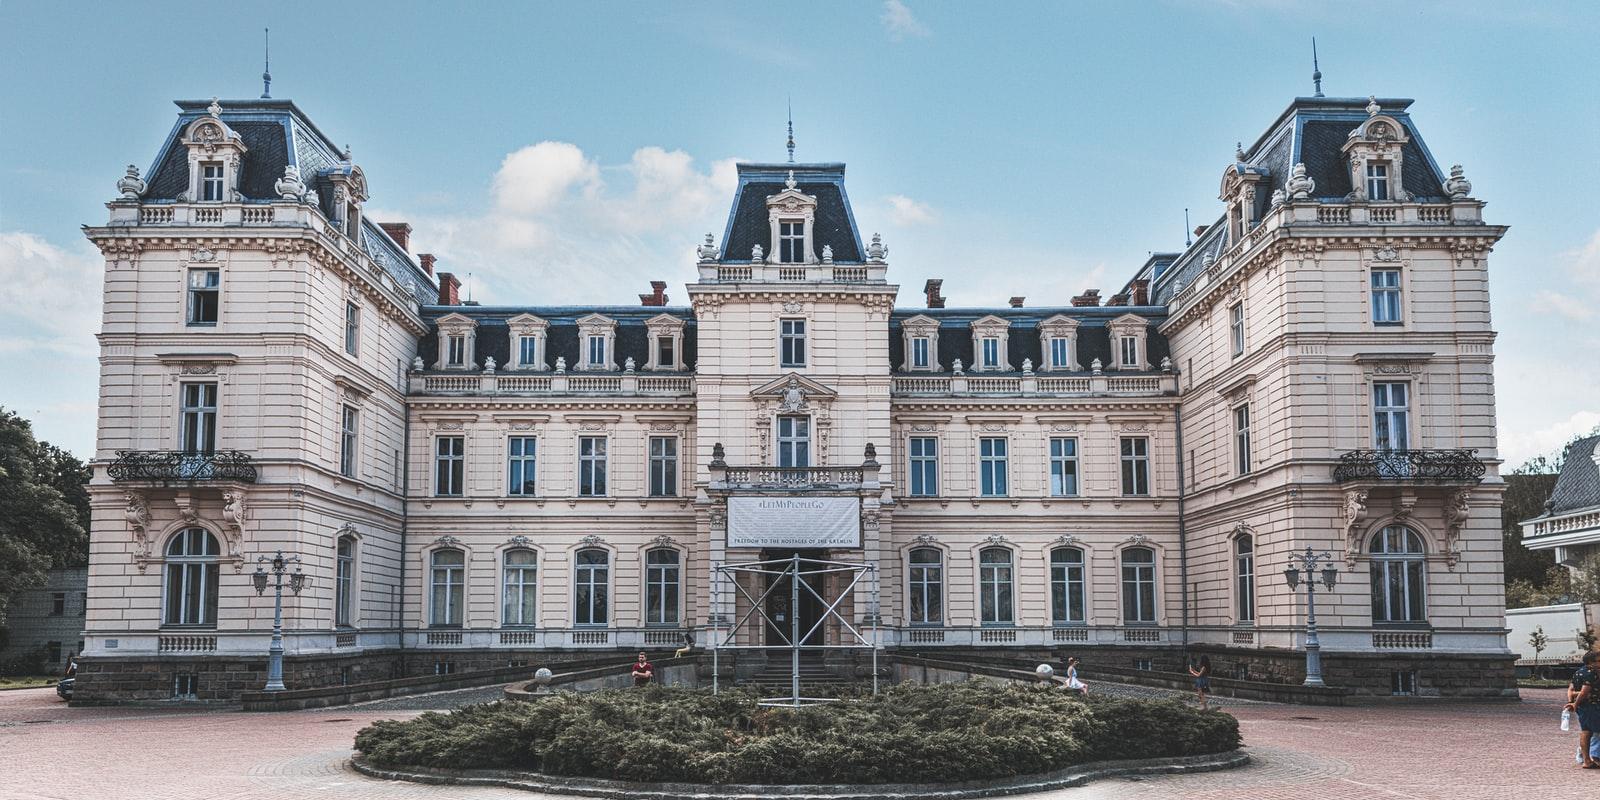 The Lviv Palace, Ukraine